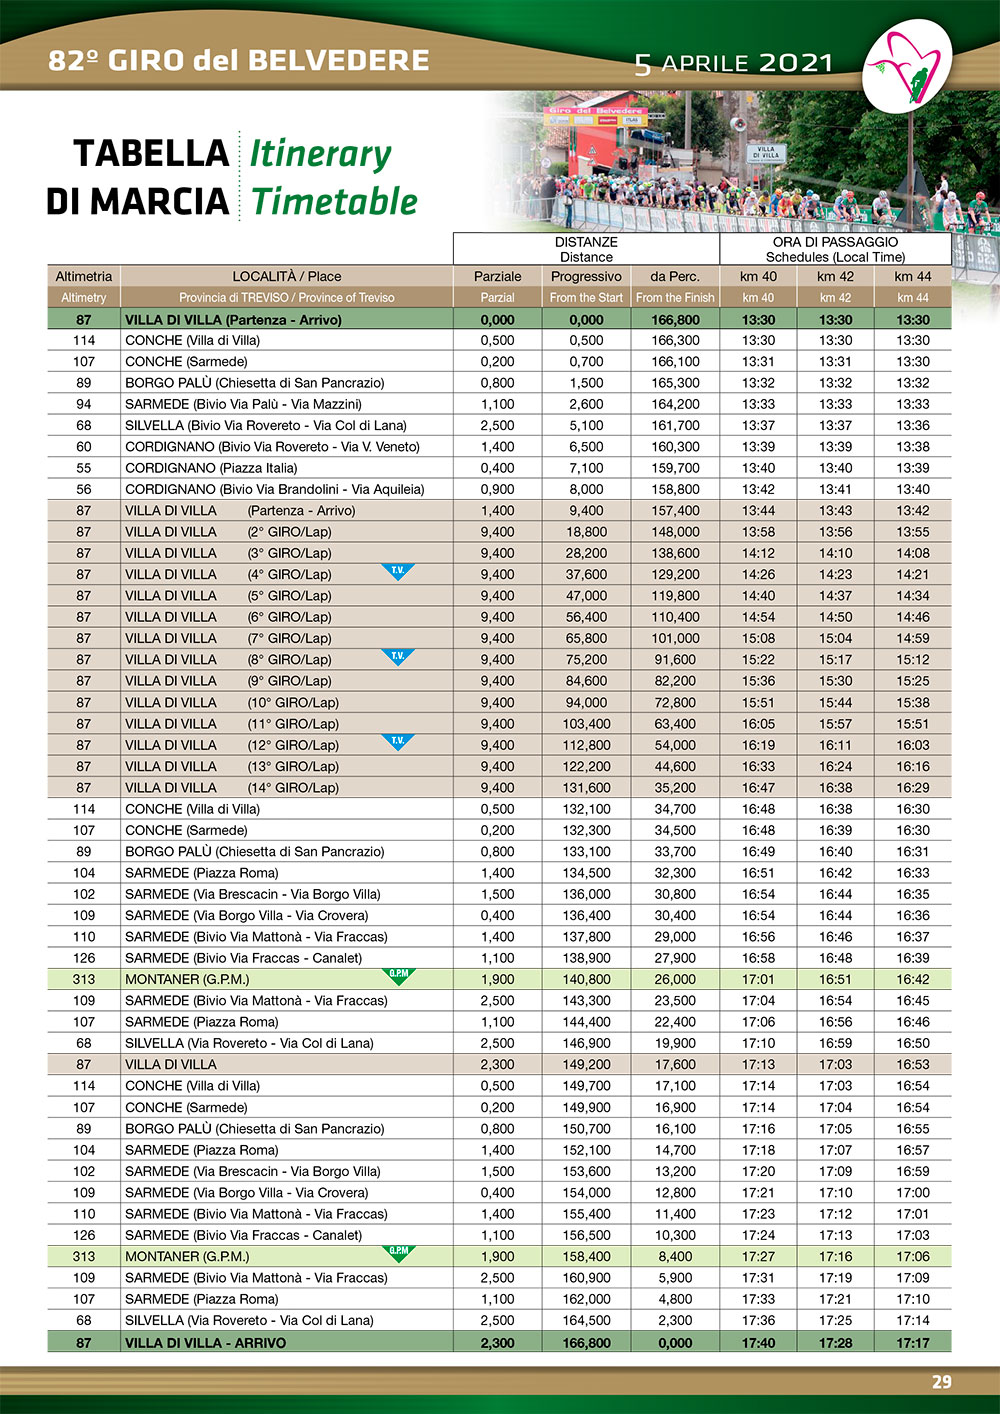 Giro del Belvedere - Timetable 2017